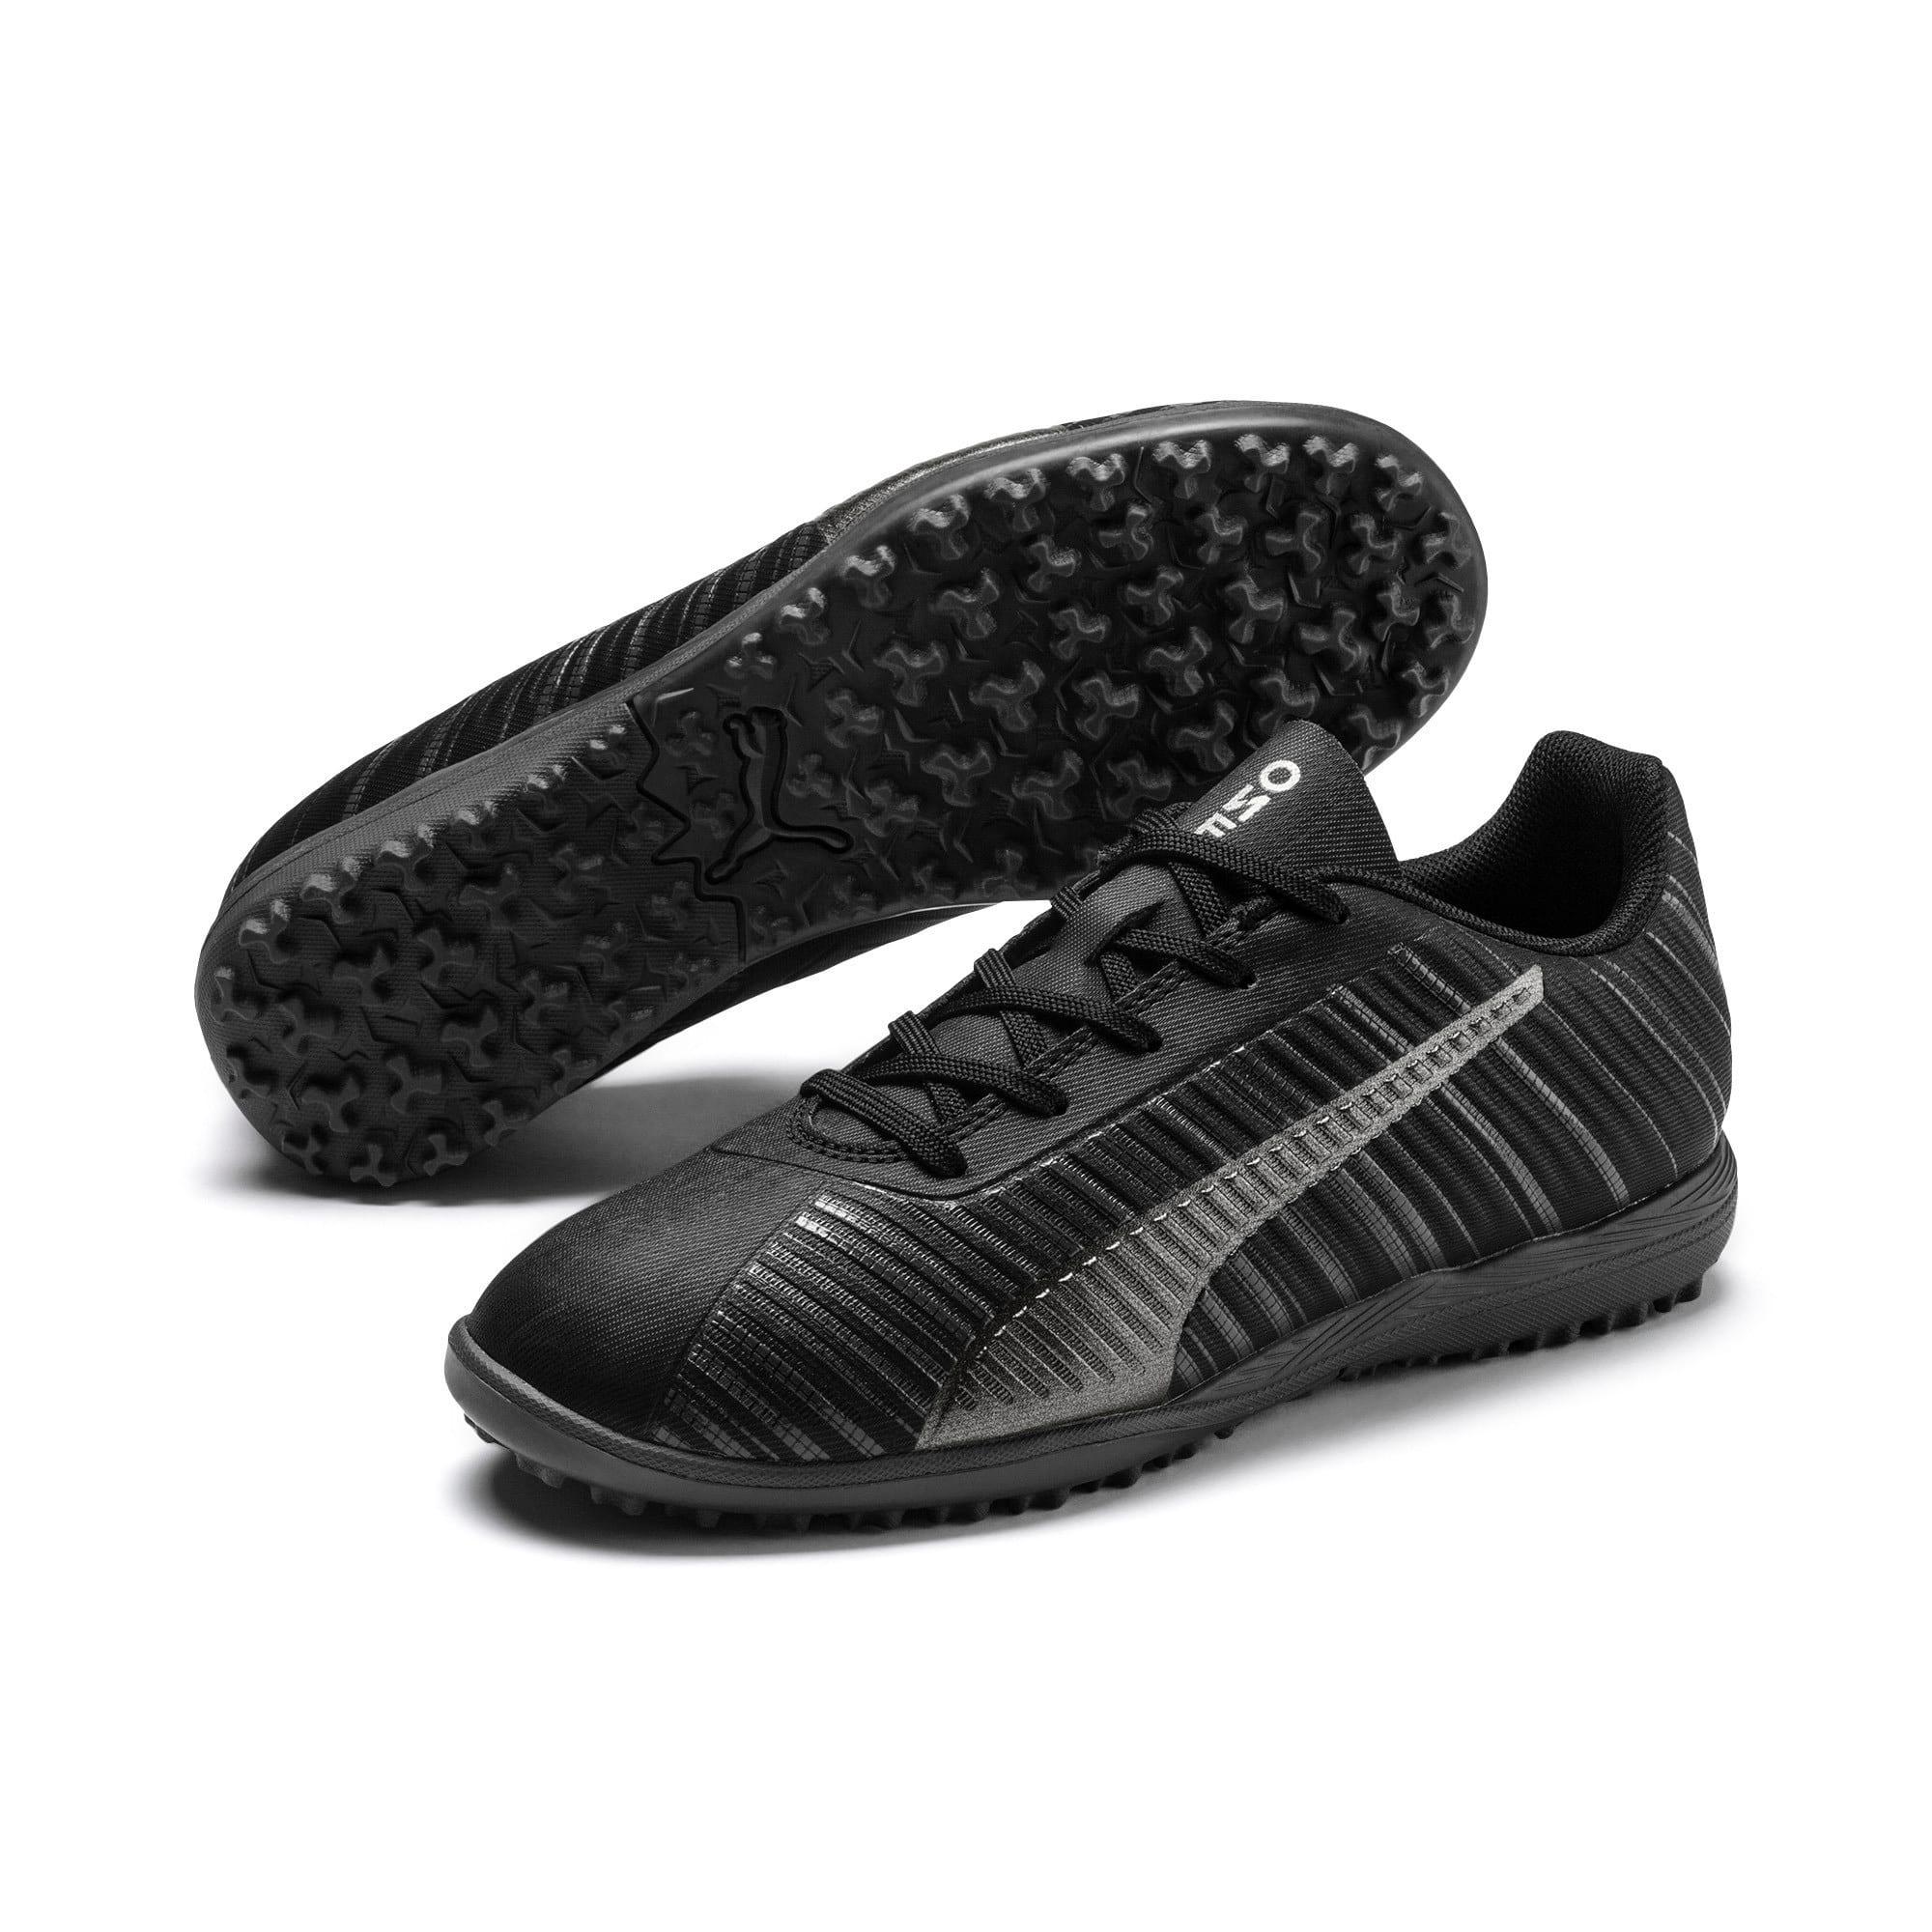 Thumbnail 2 of PUMA ONE 5.4 TT Soccer Shoes JR, Black-Black-Puma Aged Silver, medium